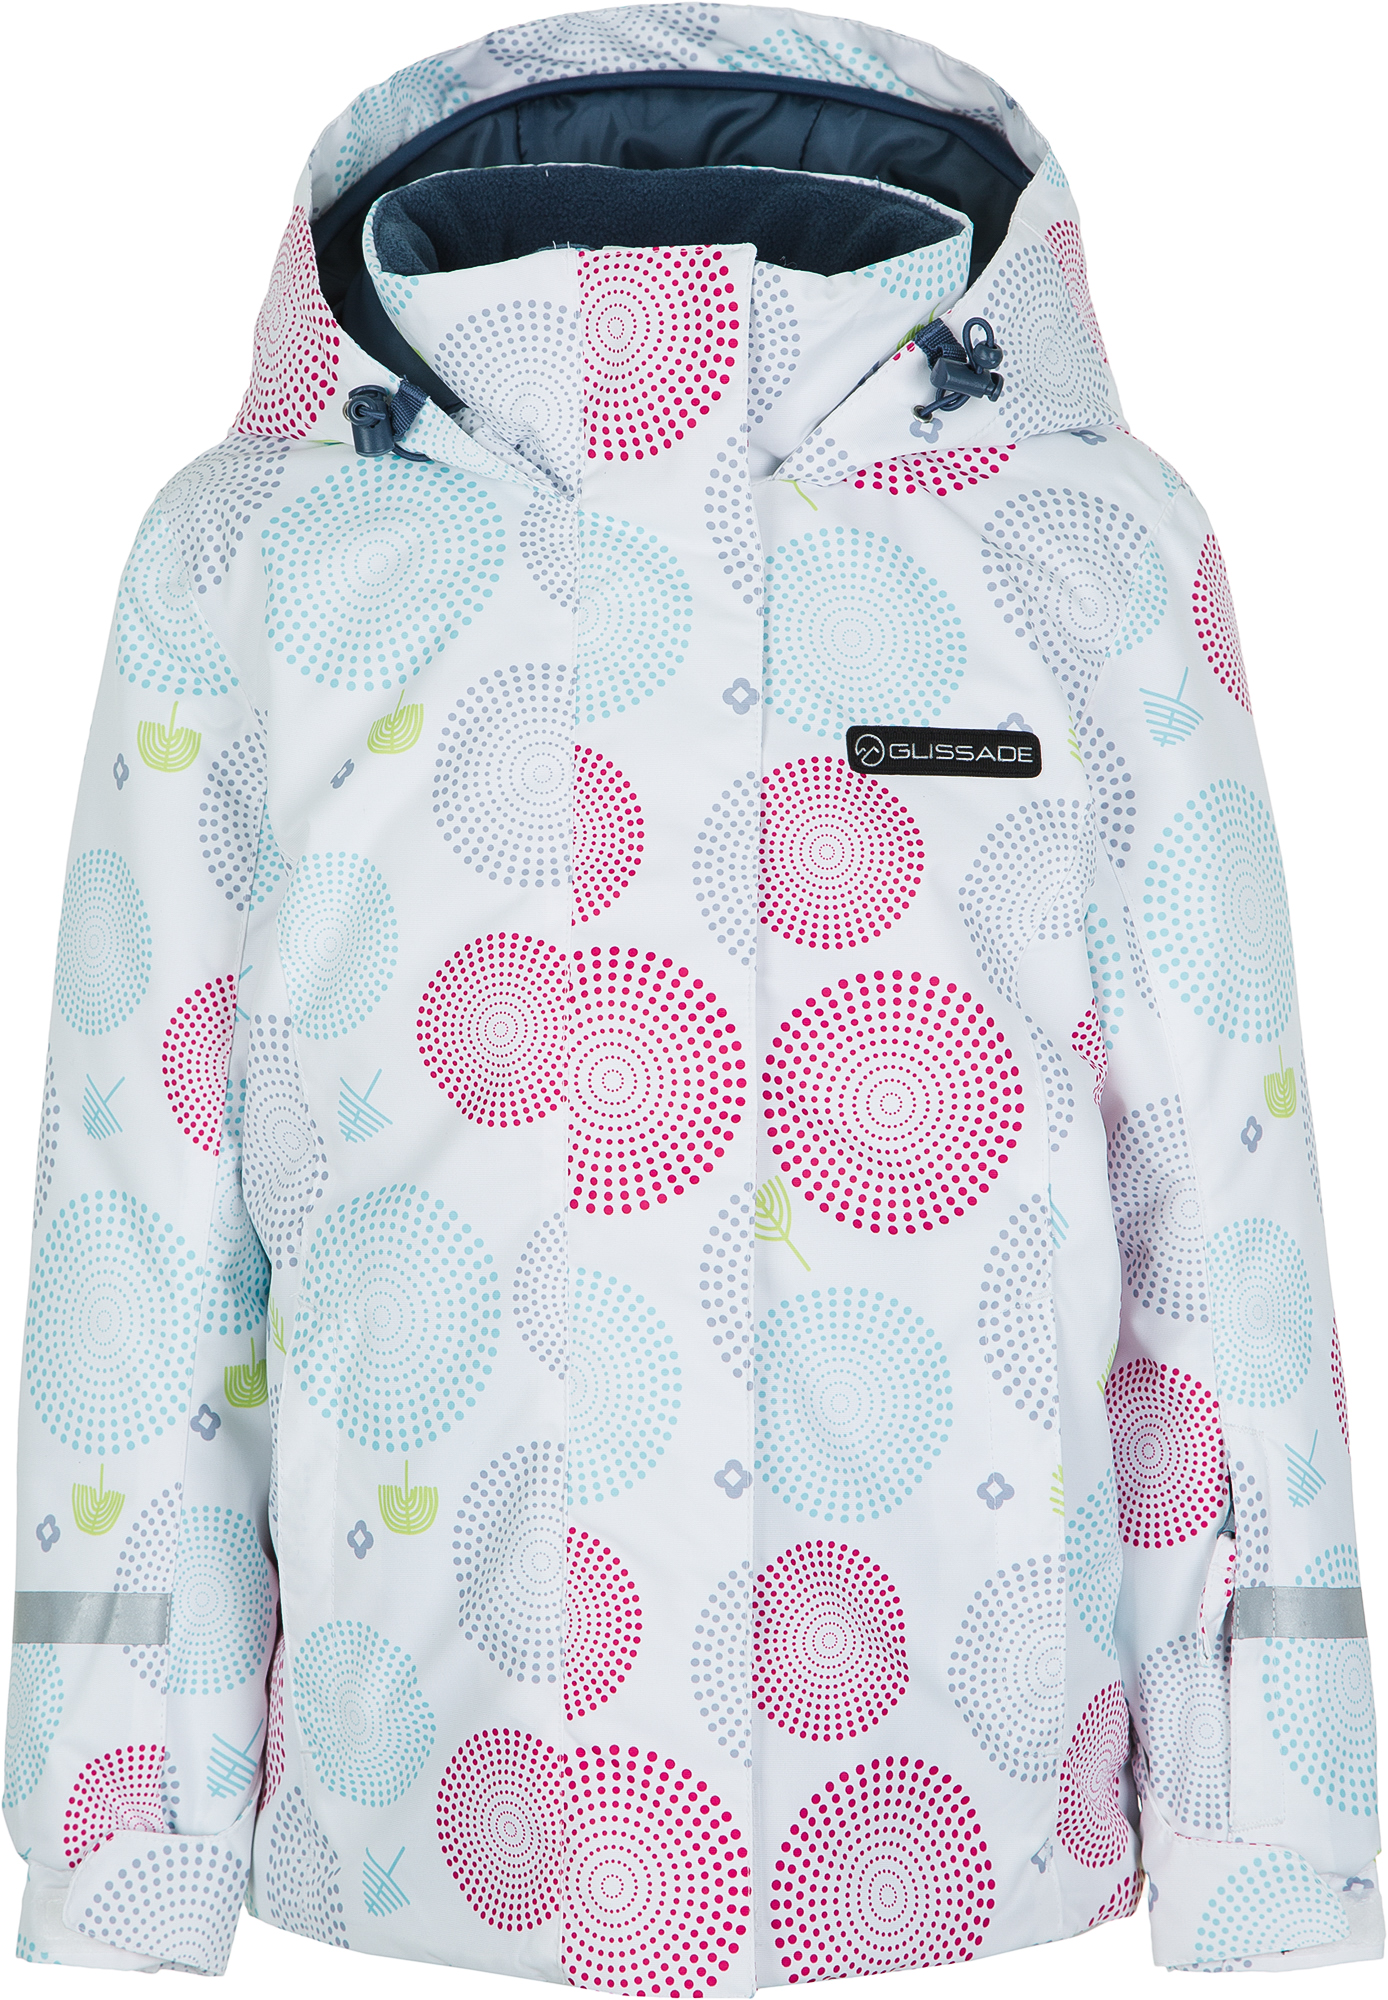 Glissade Куртка для девочек Glissade, размер 122